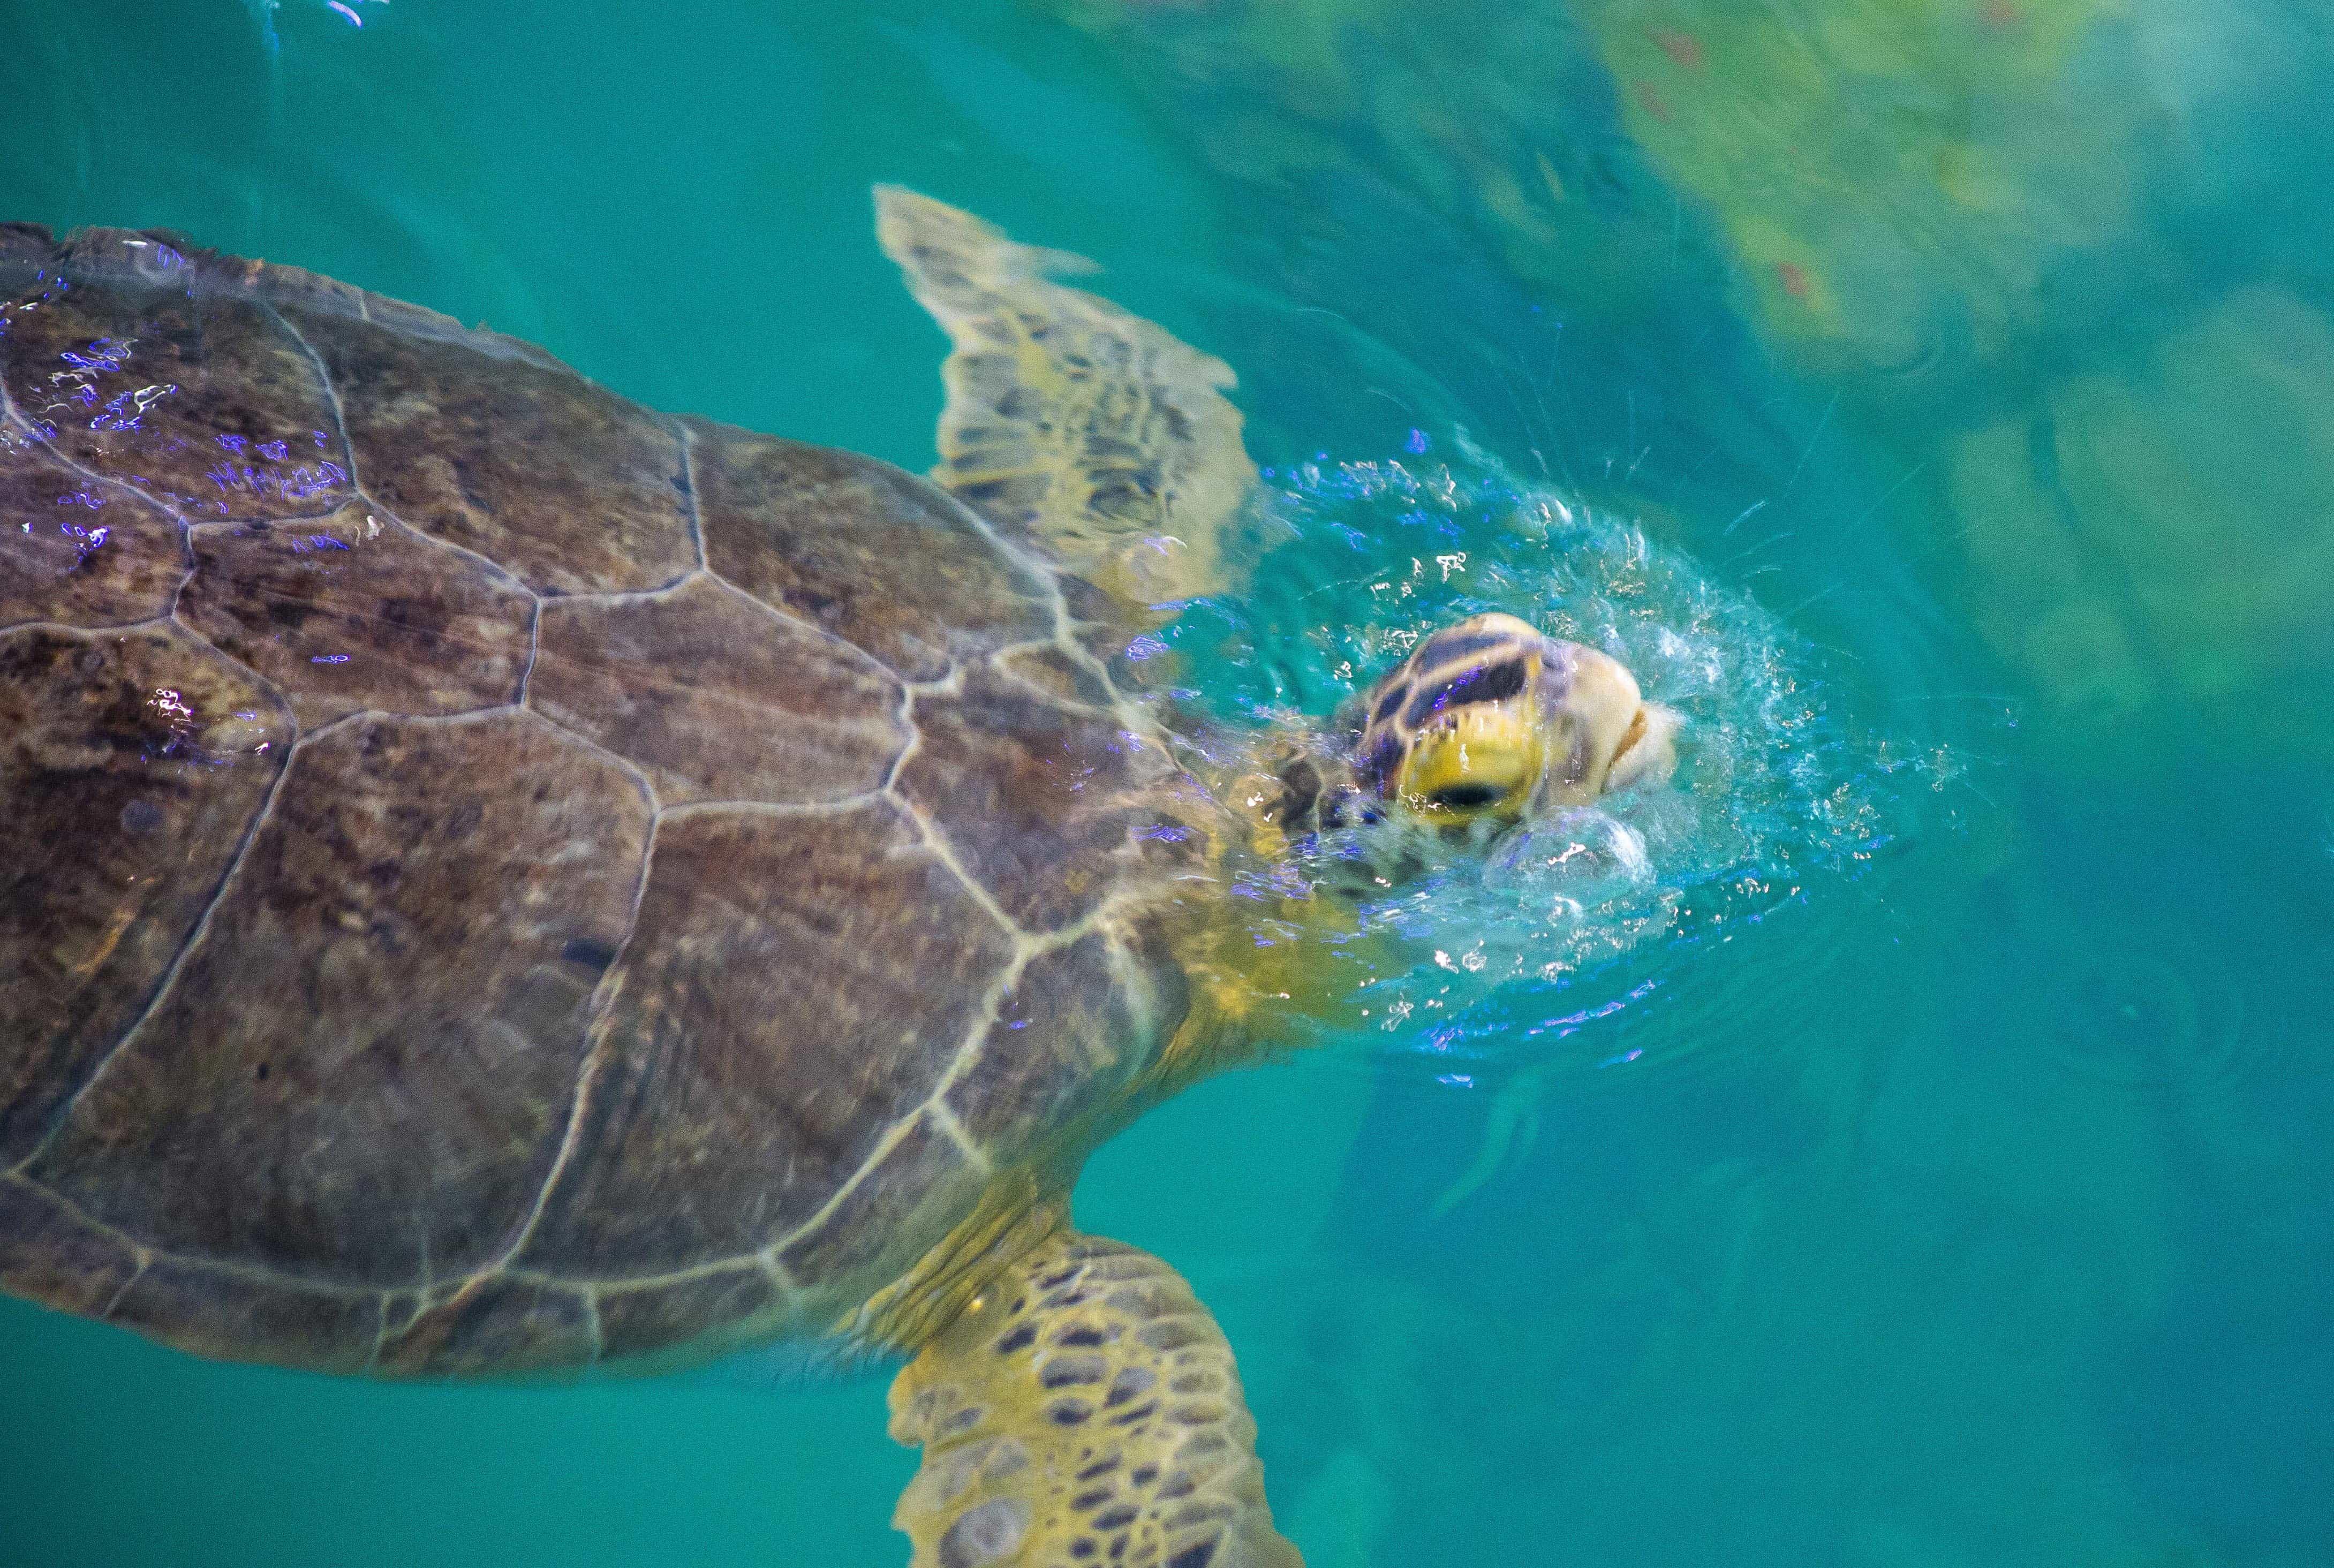 Clearwater Marine Aquarium FINALS-4 - Saving Room for Dessert on